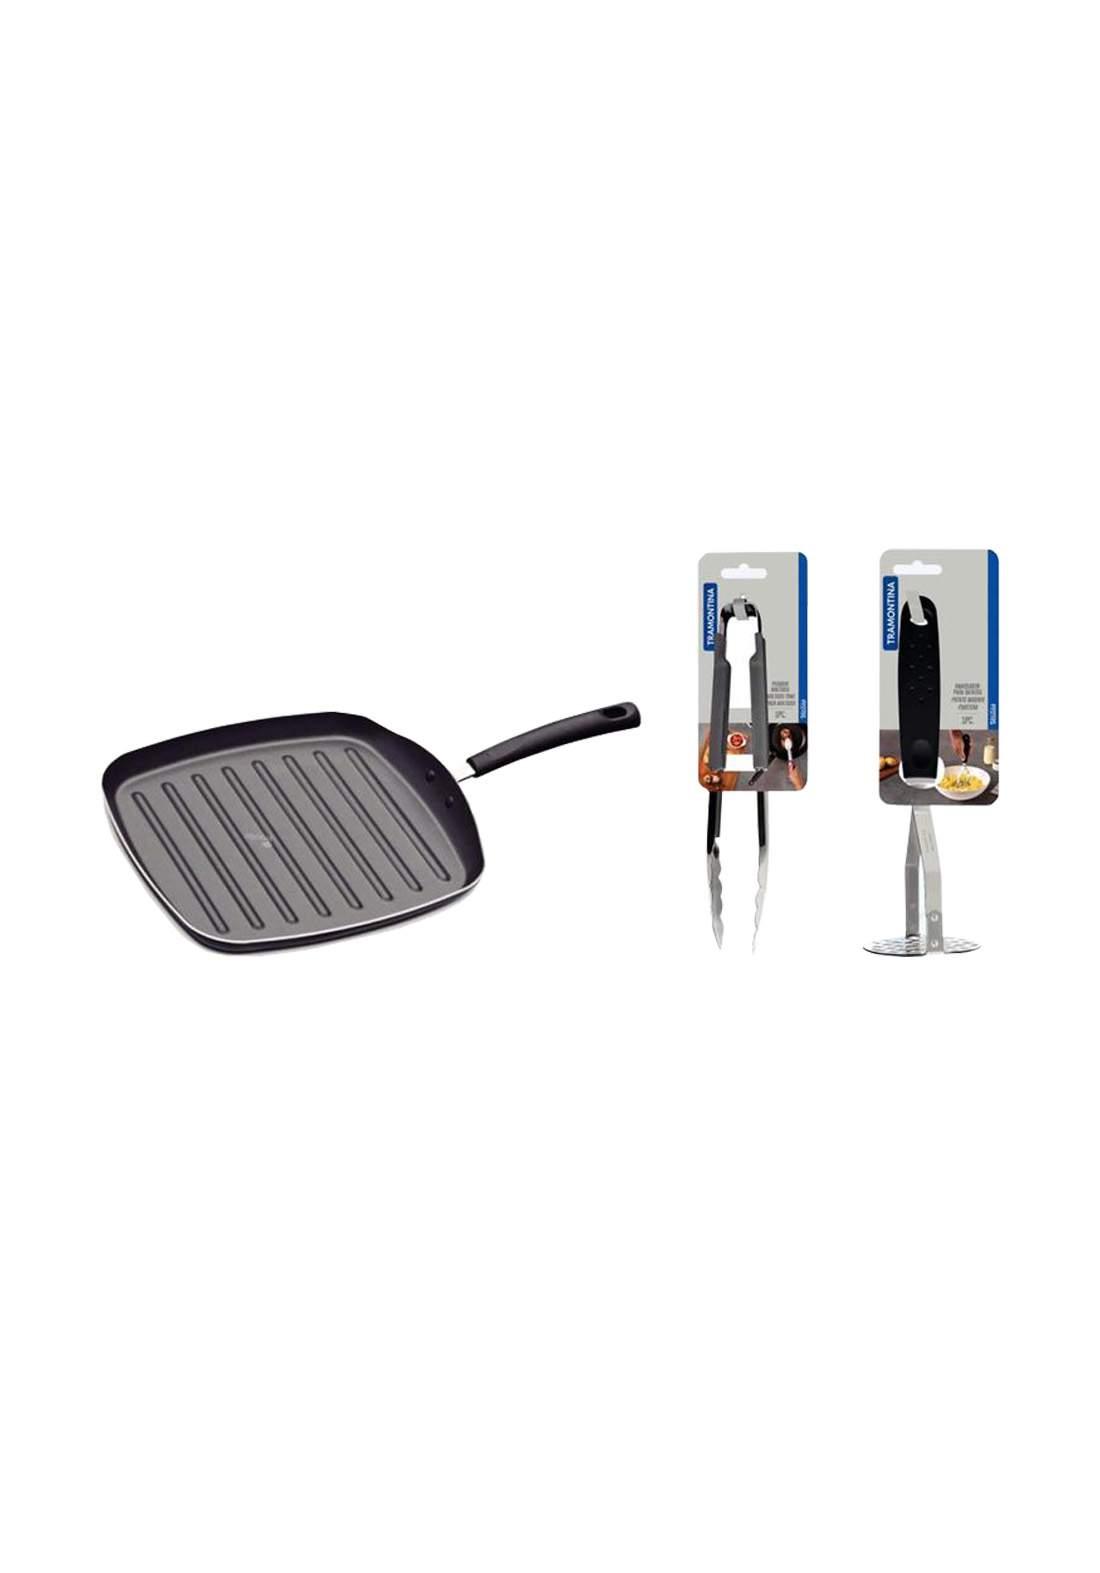 Grill Black عرض مقلاة ستيك 20124-024 + هراسة بطاطس 25655-100 + ملقط شواء  25056/160